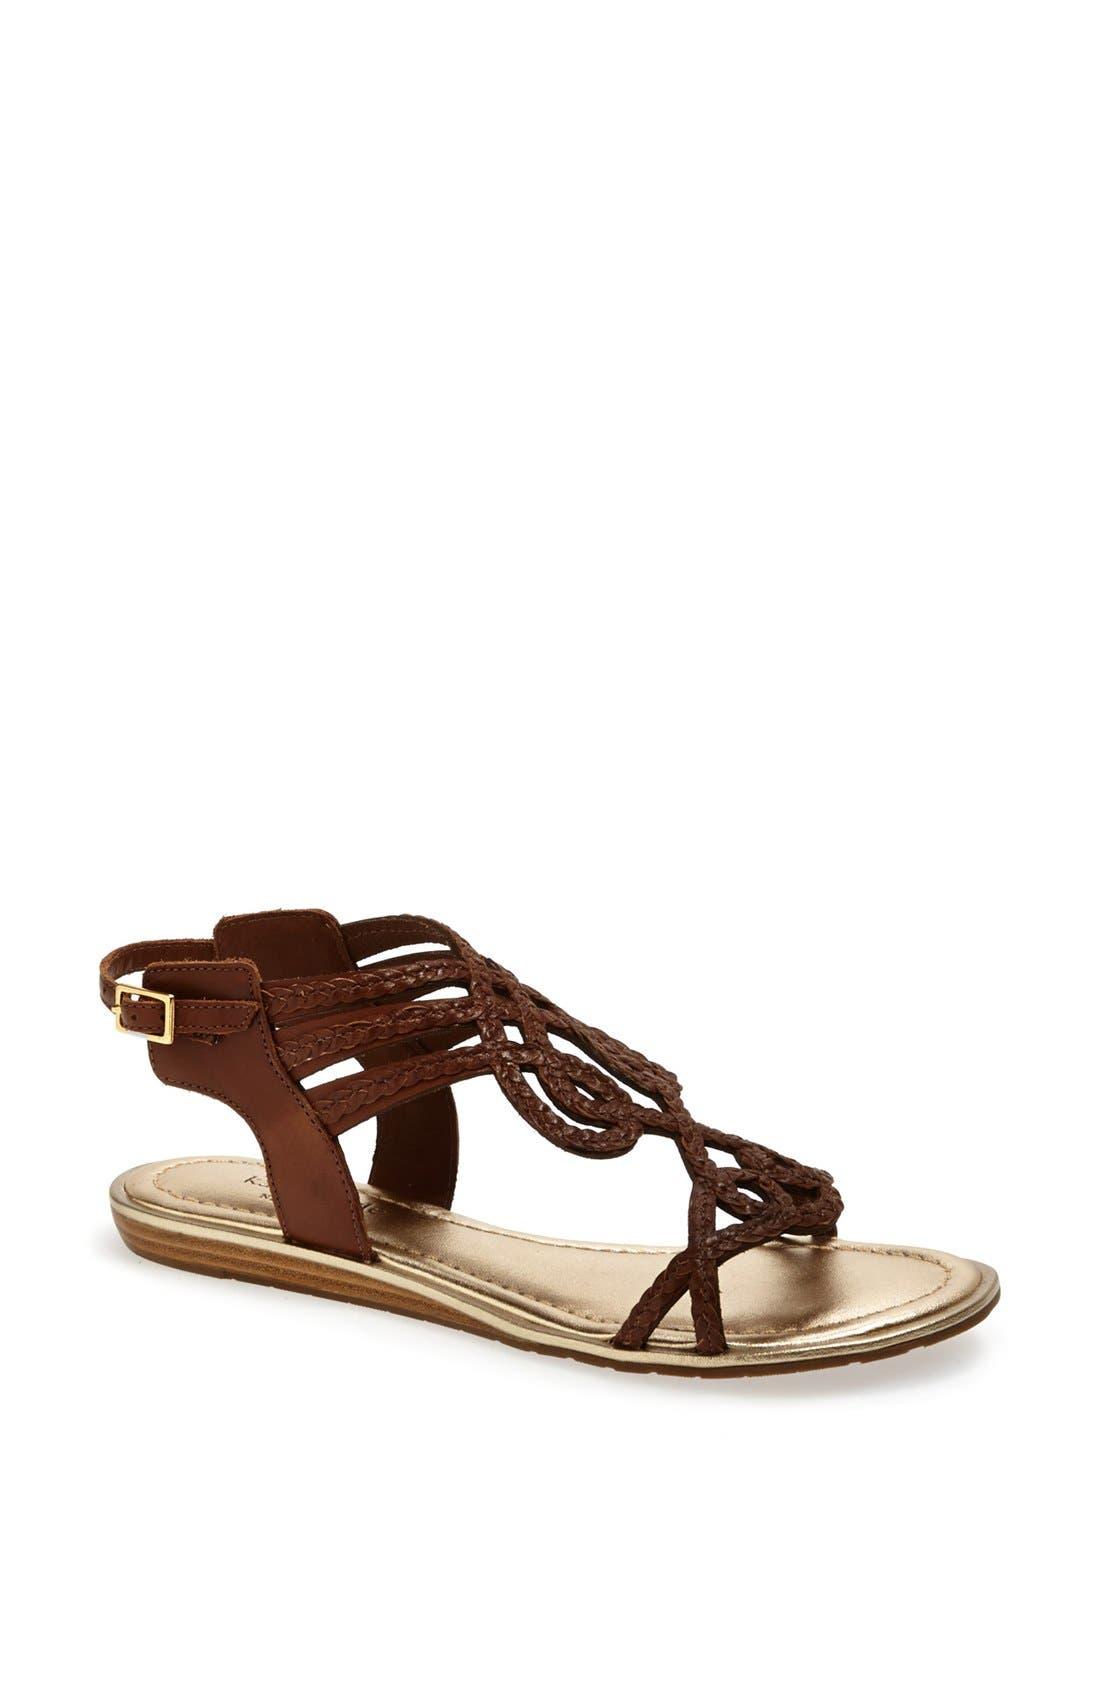 Main Image - kate spade new york 'ayn' sandal